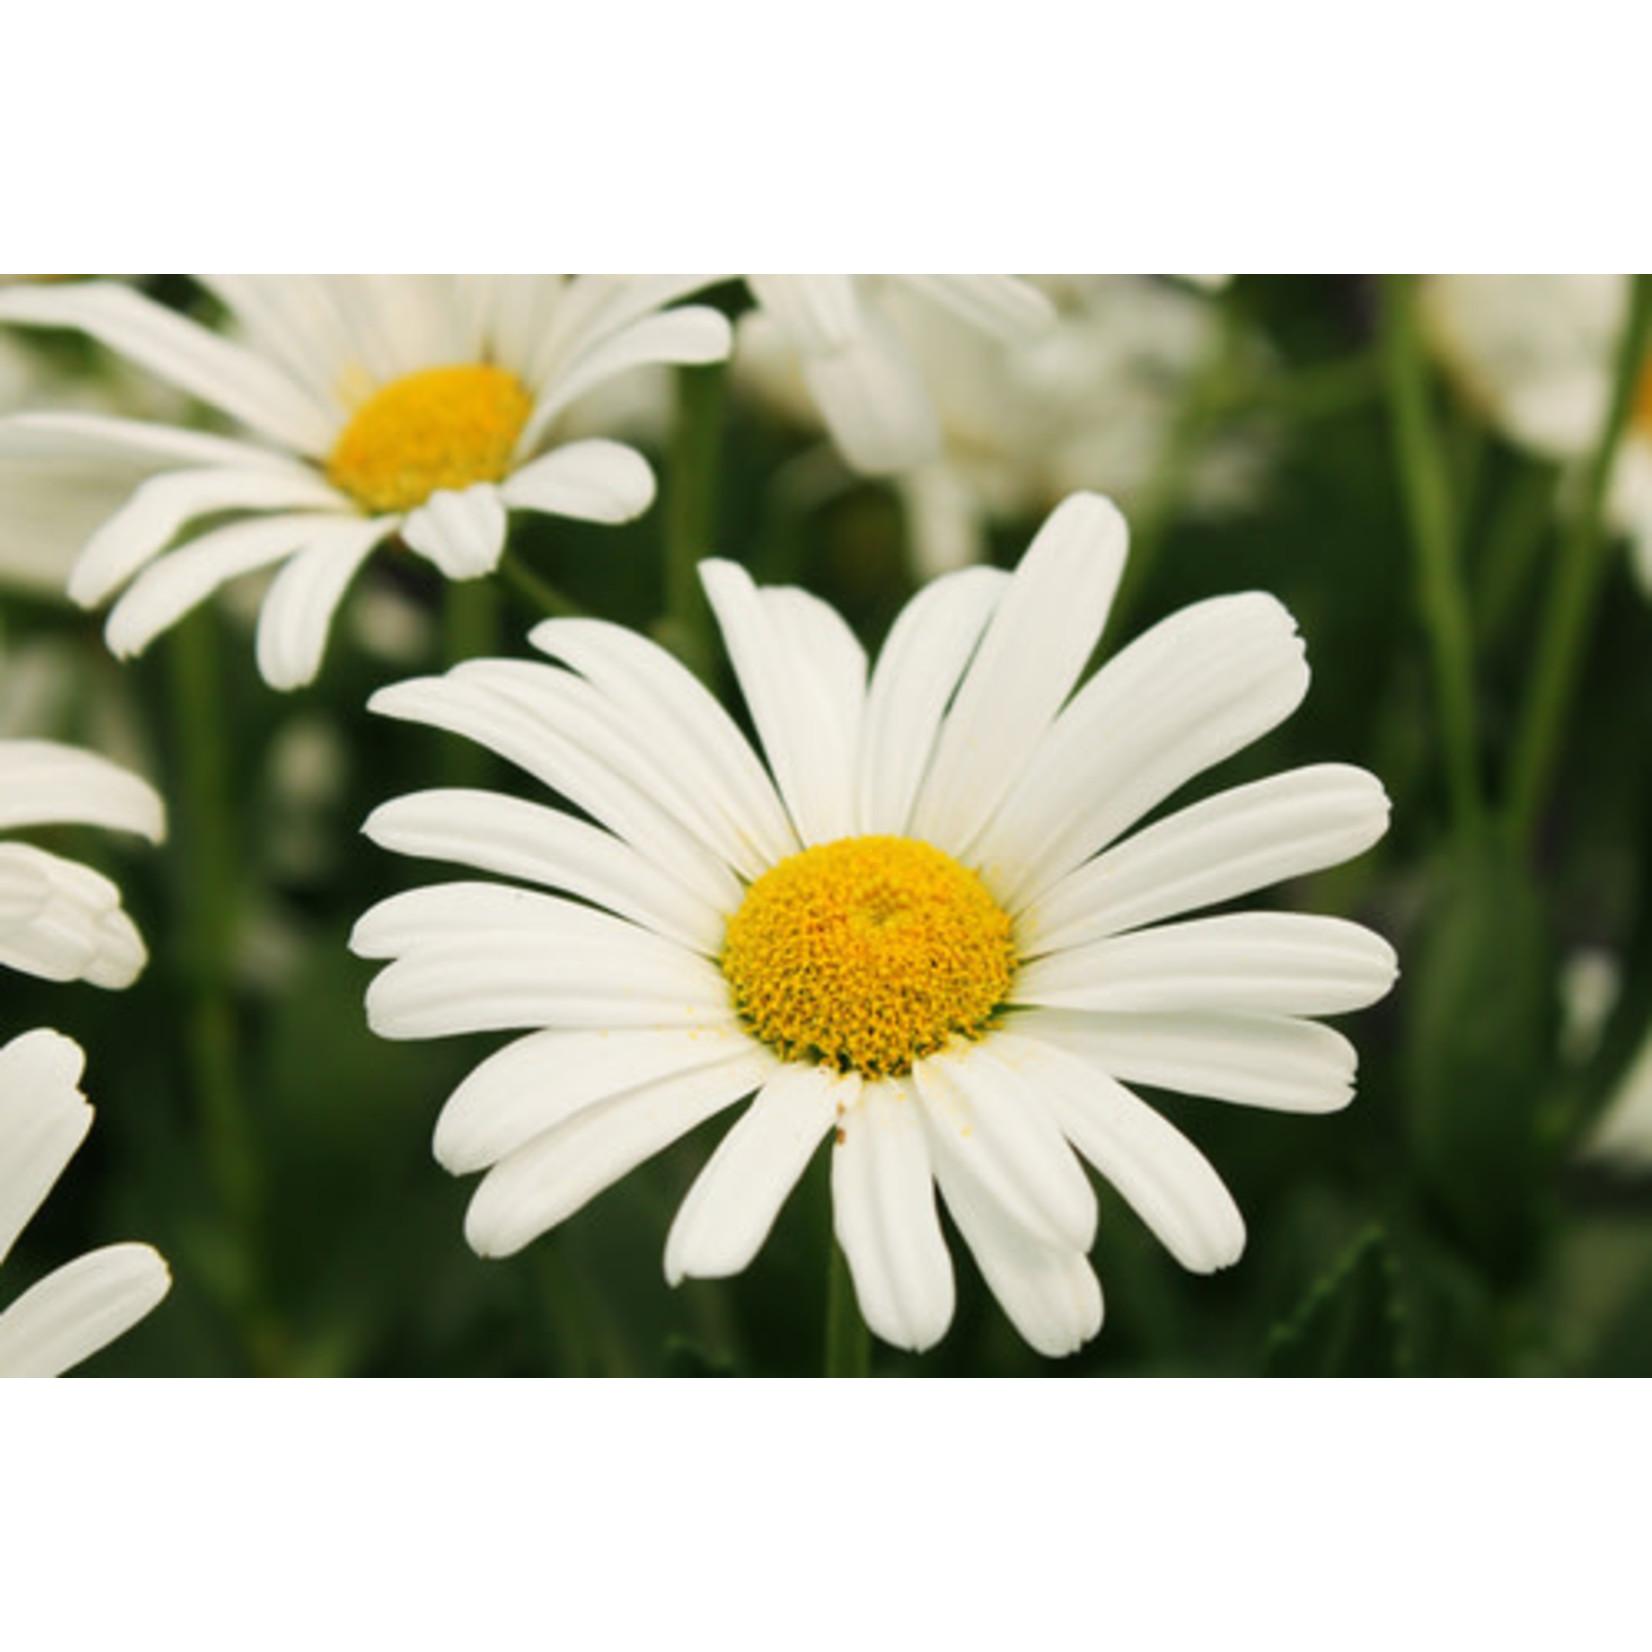 Shasta Daisy 'highland white dream' - 2 gal